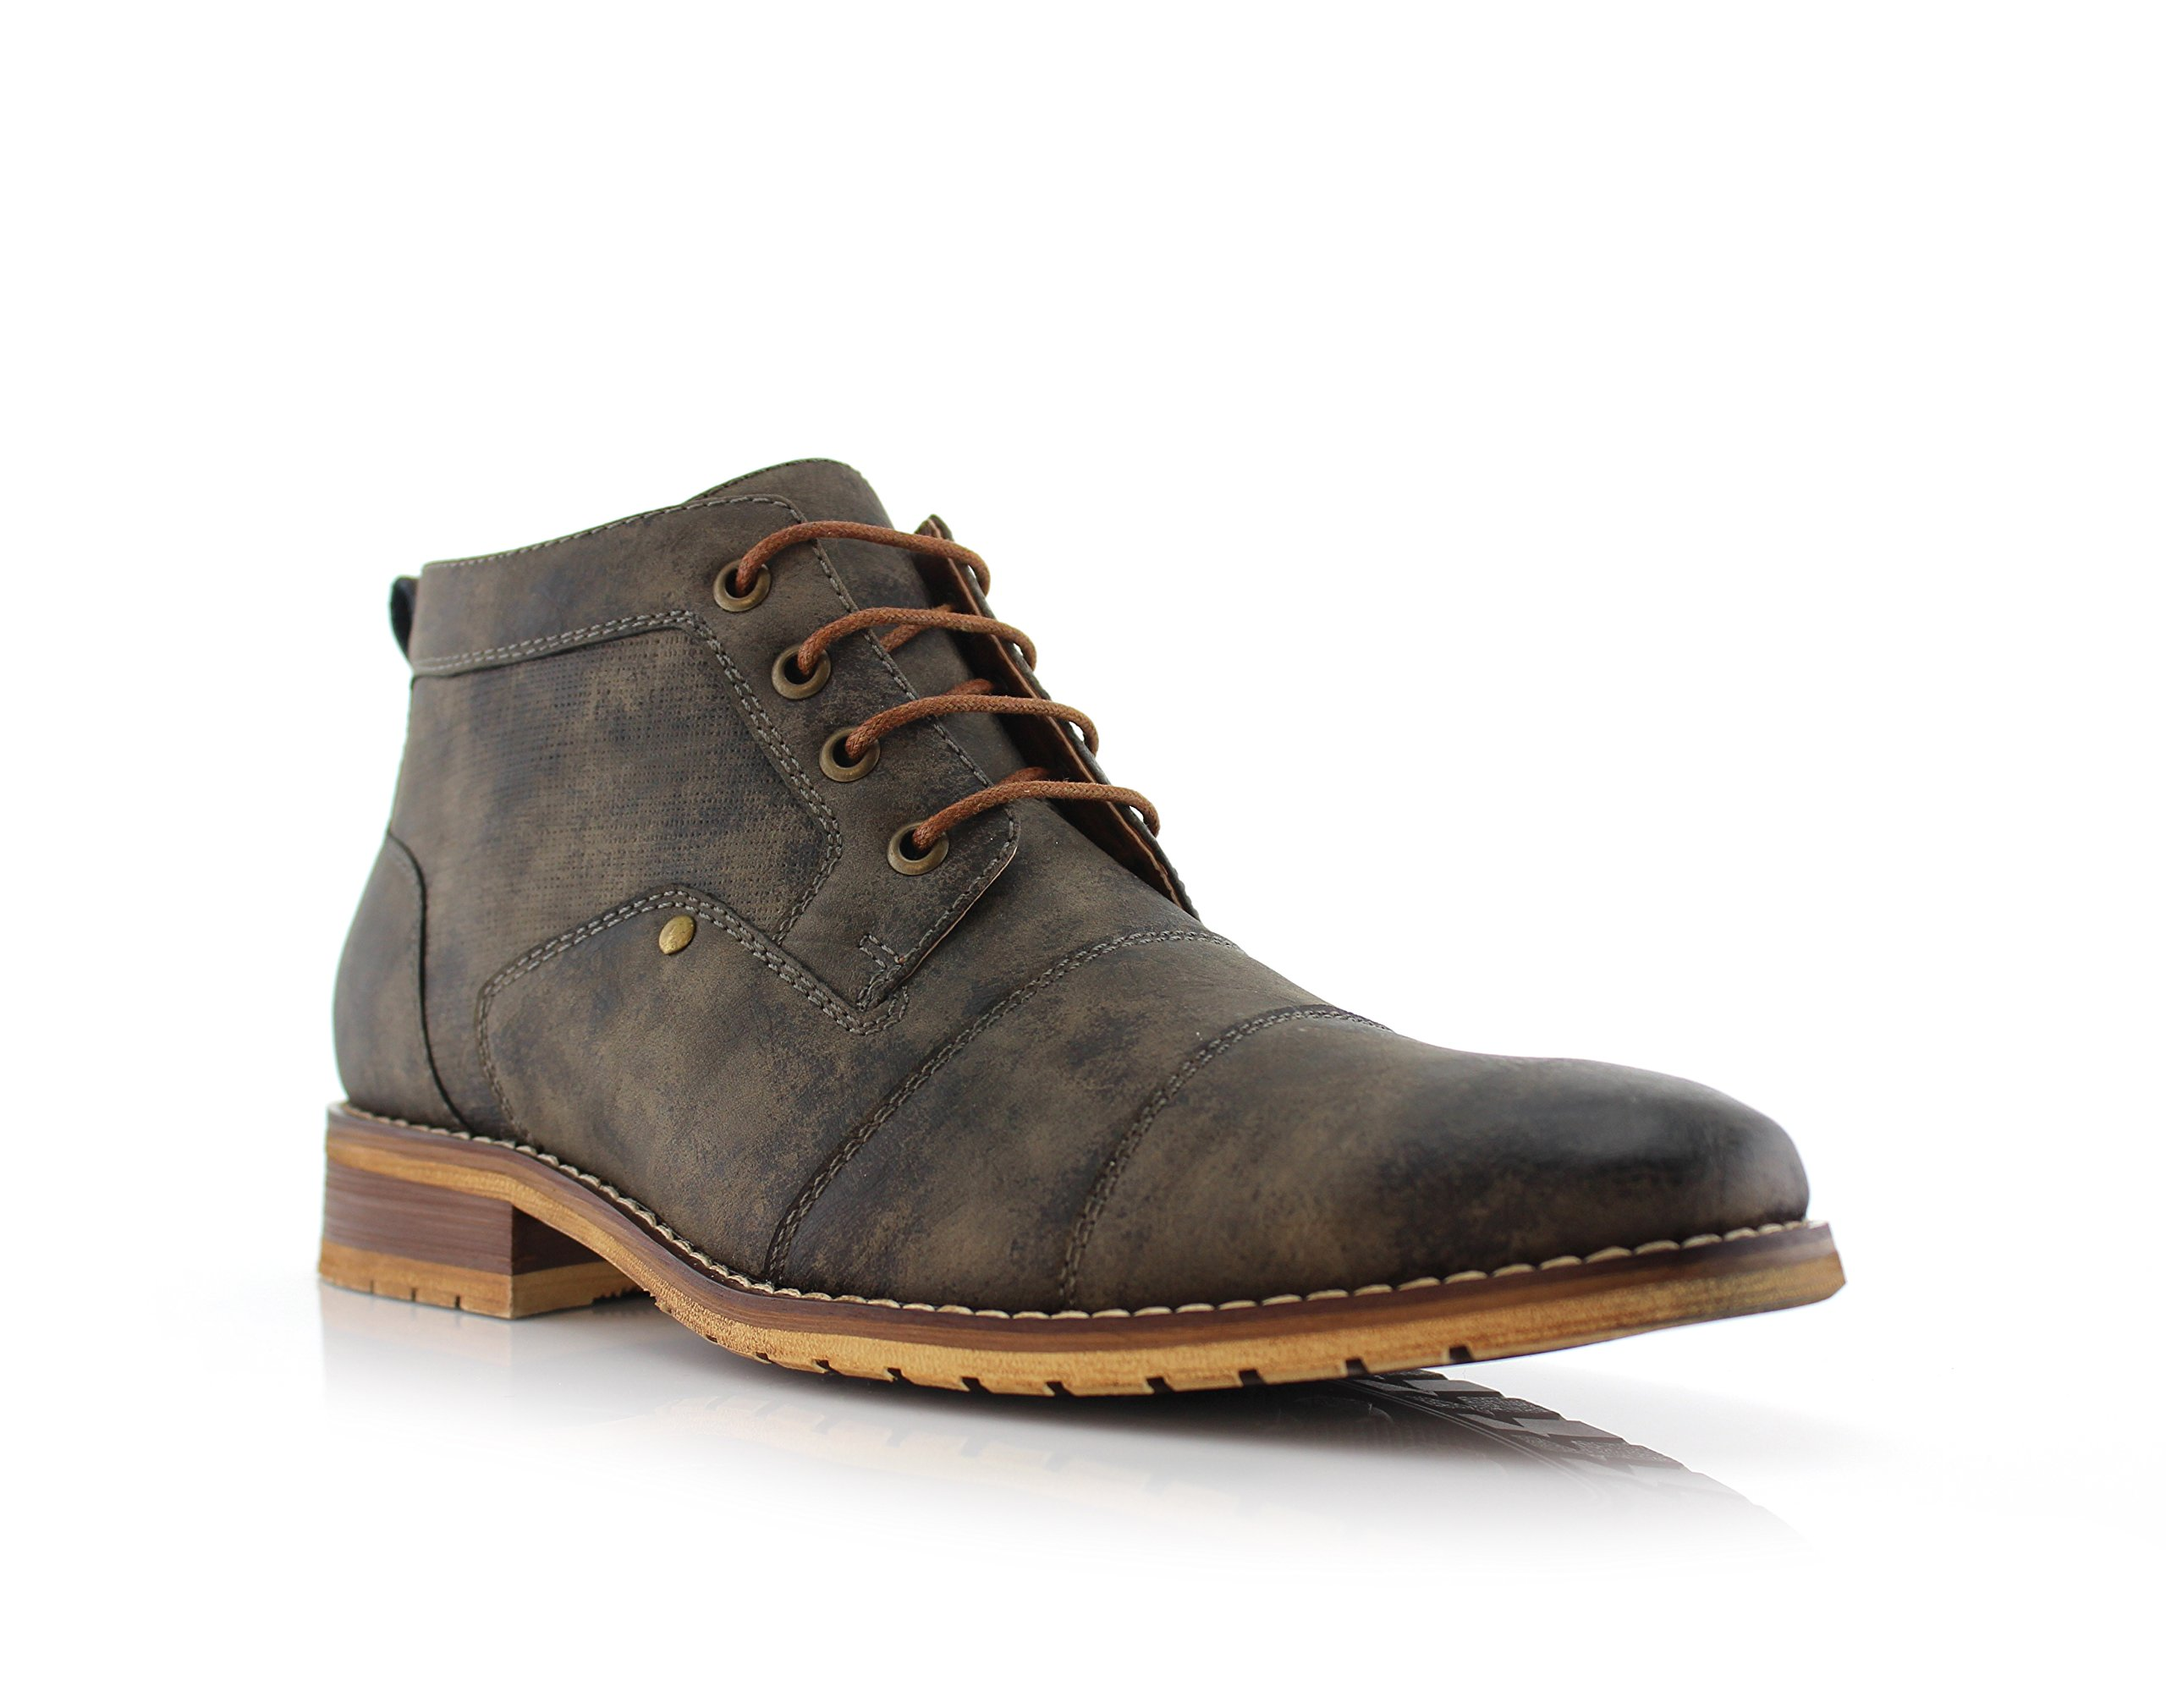 Ferro Aldo Blaine MFA806035 Mens Casual Brogue Mid-Top Lace-up and Zipper Boots – Grey, Size 10.5